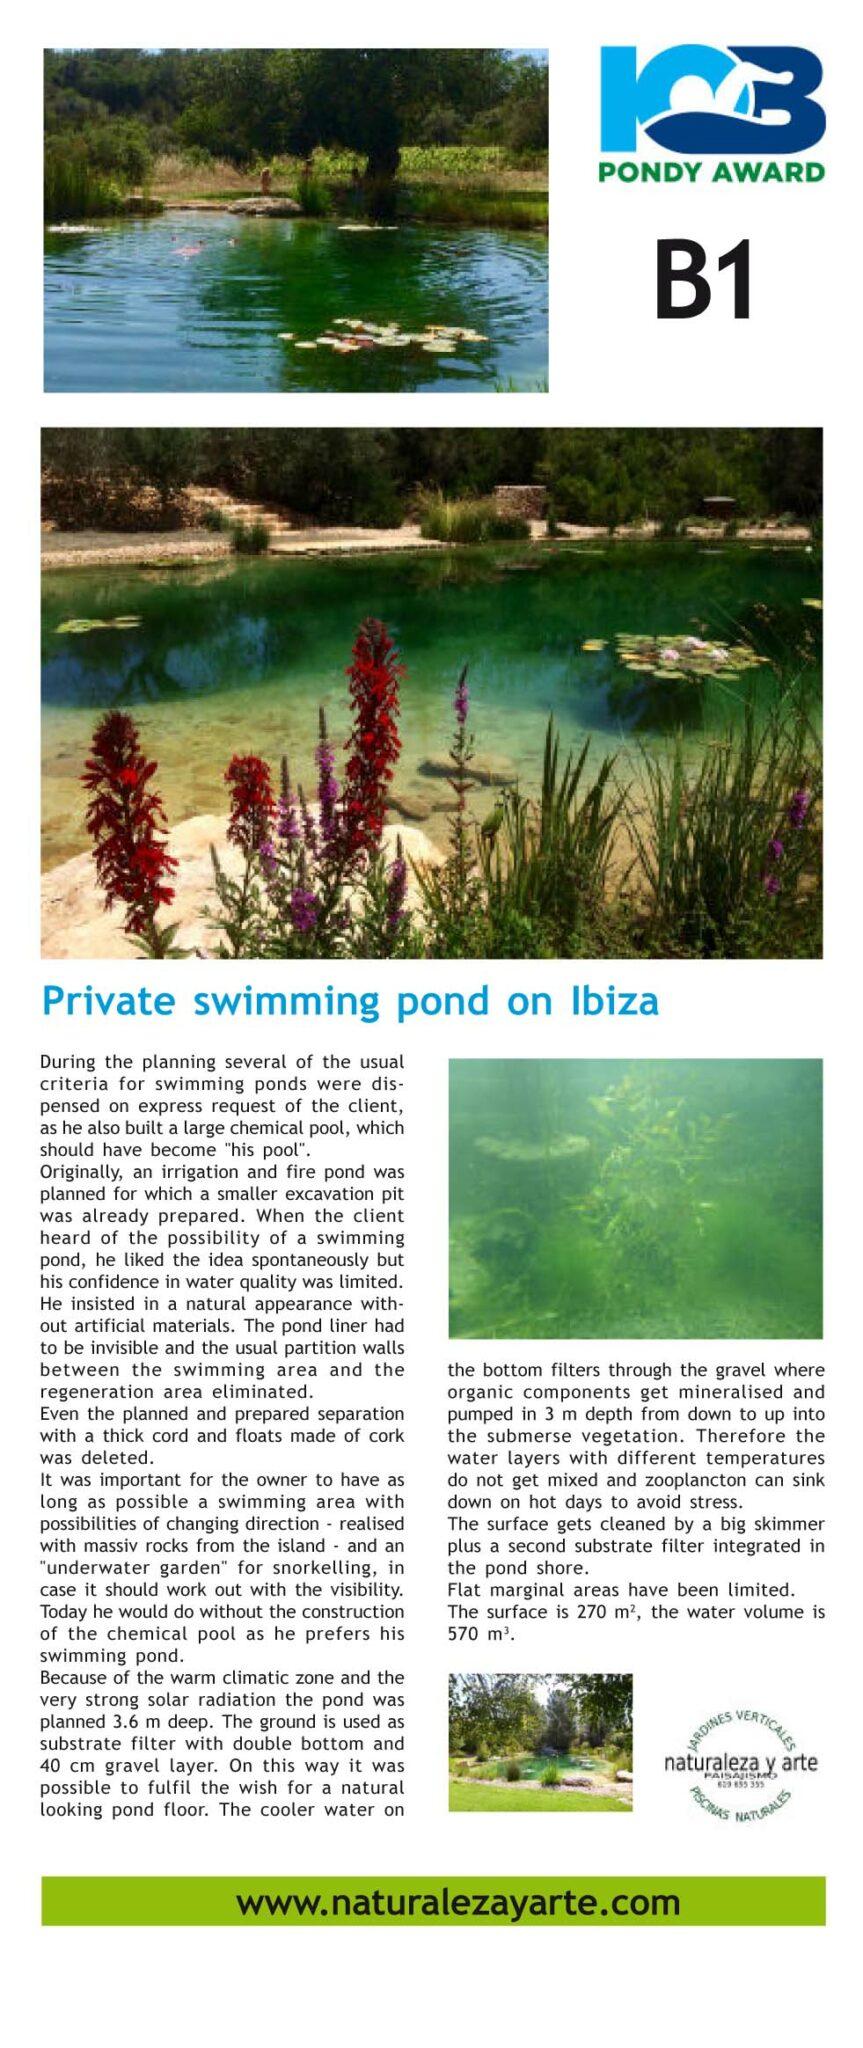 PONDY AWARD 2017 Swimming pond private Nominee naturaleza y arte